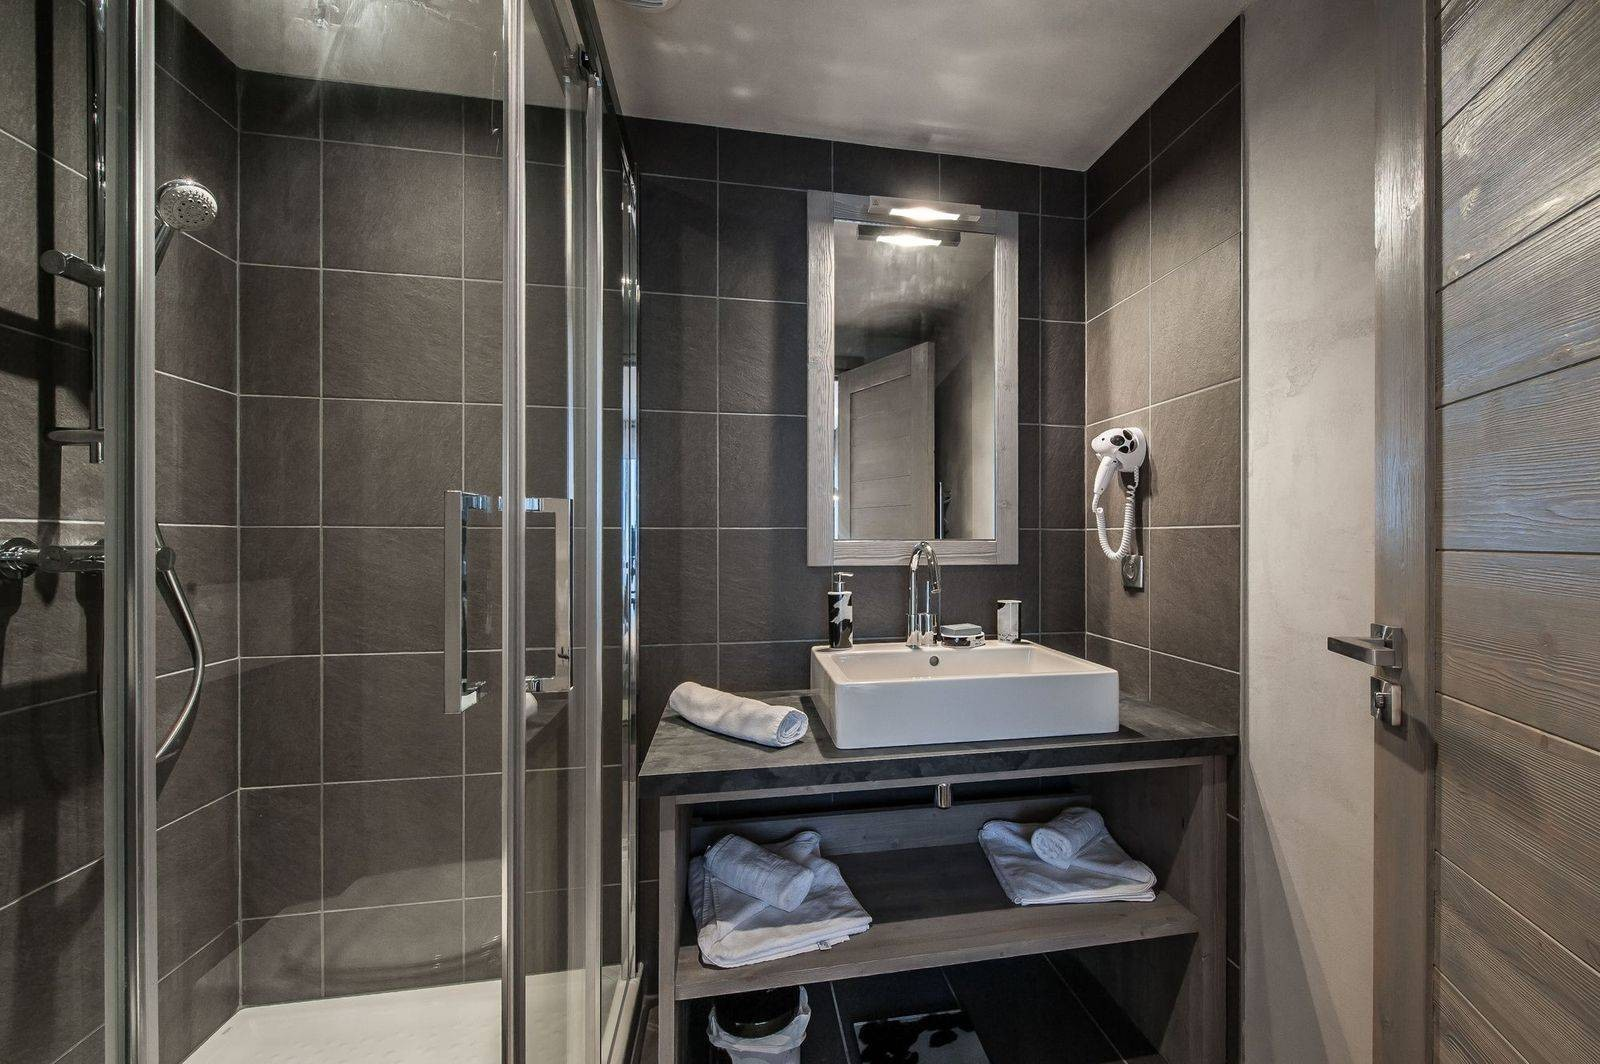 Courchevel 1650 Luxury Rental Appartment Dracali Bathroom 3